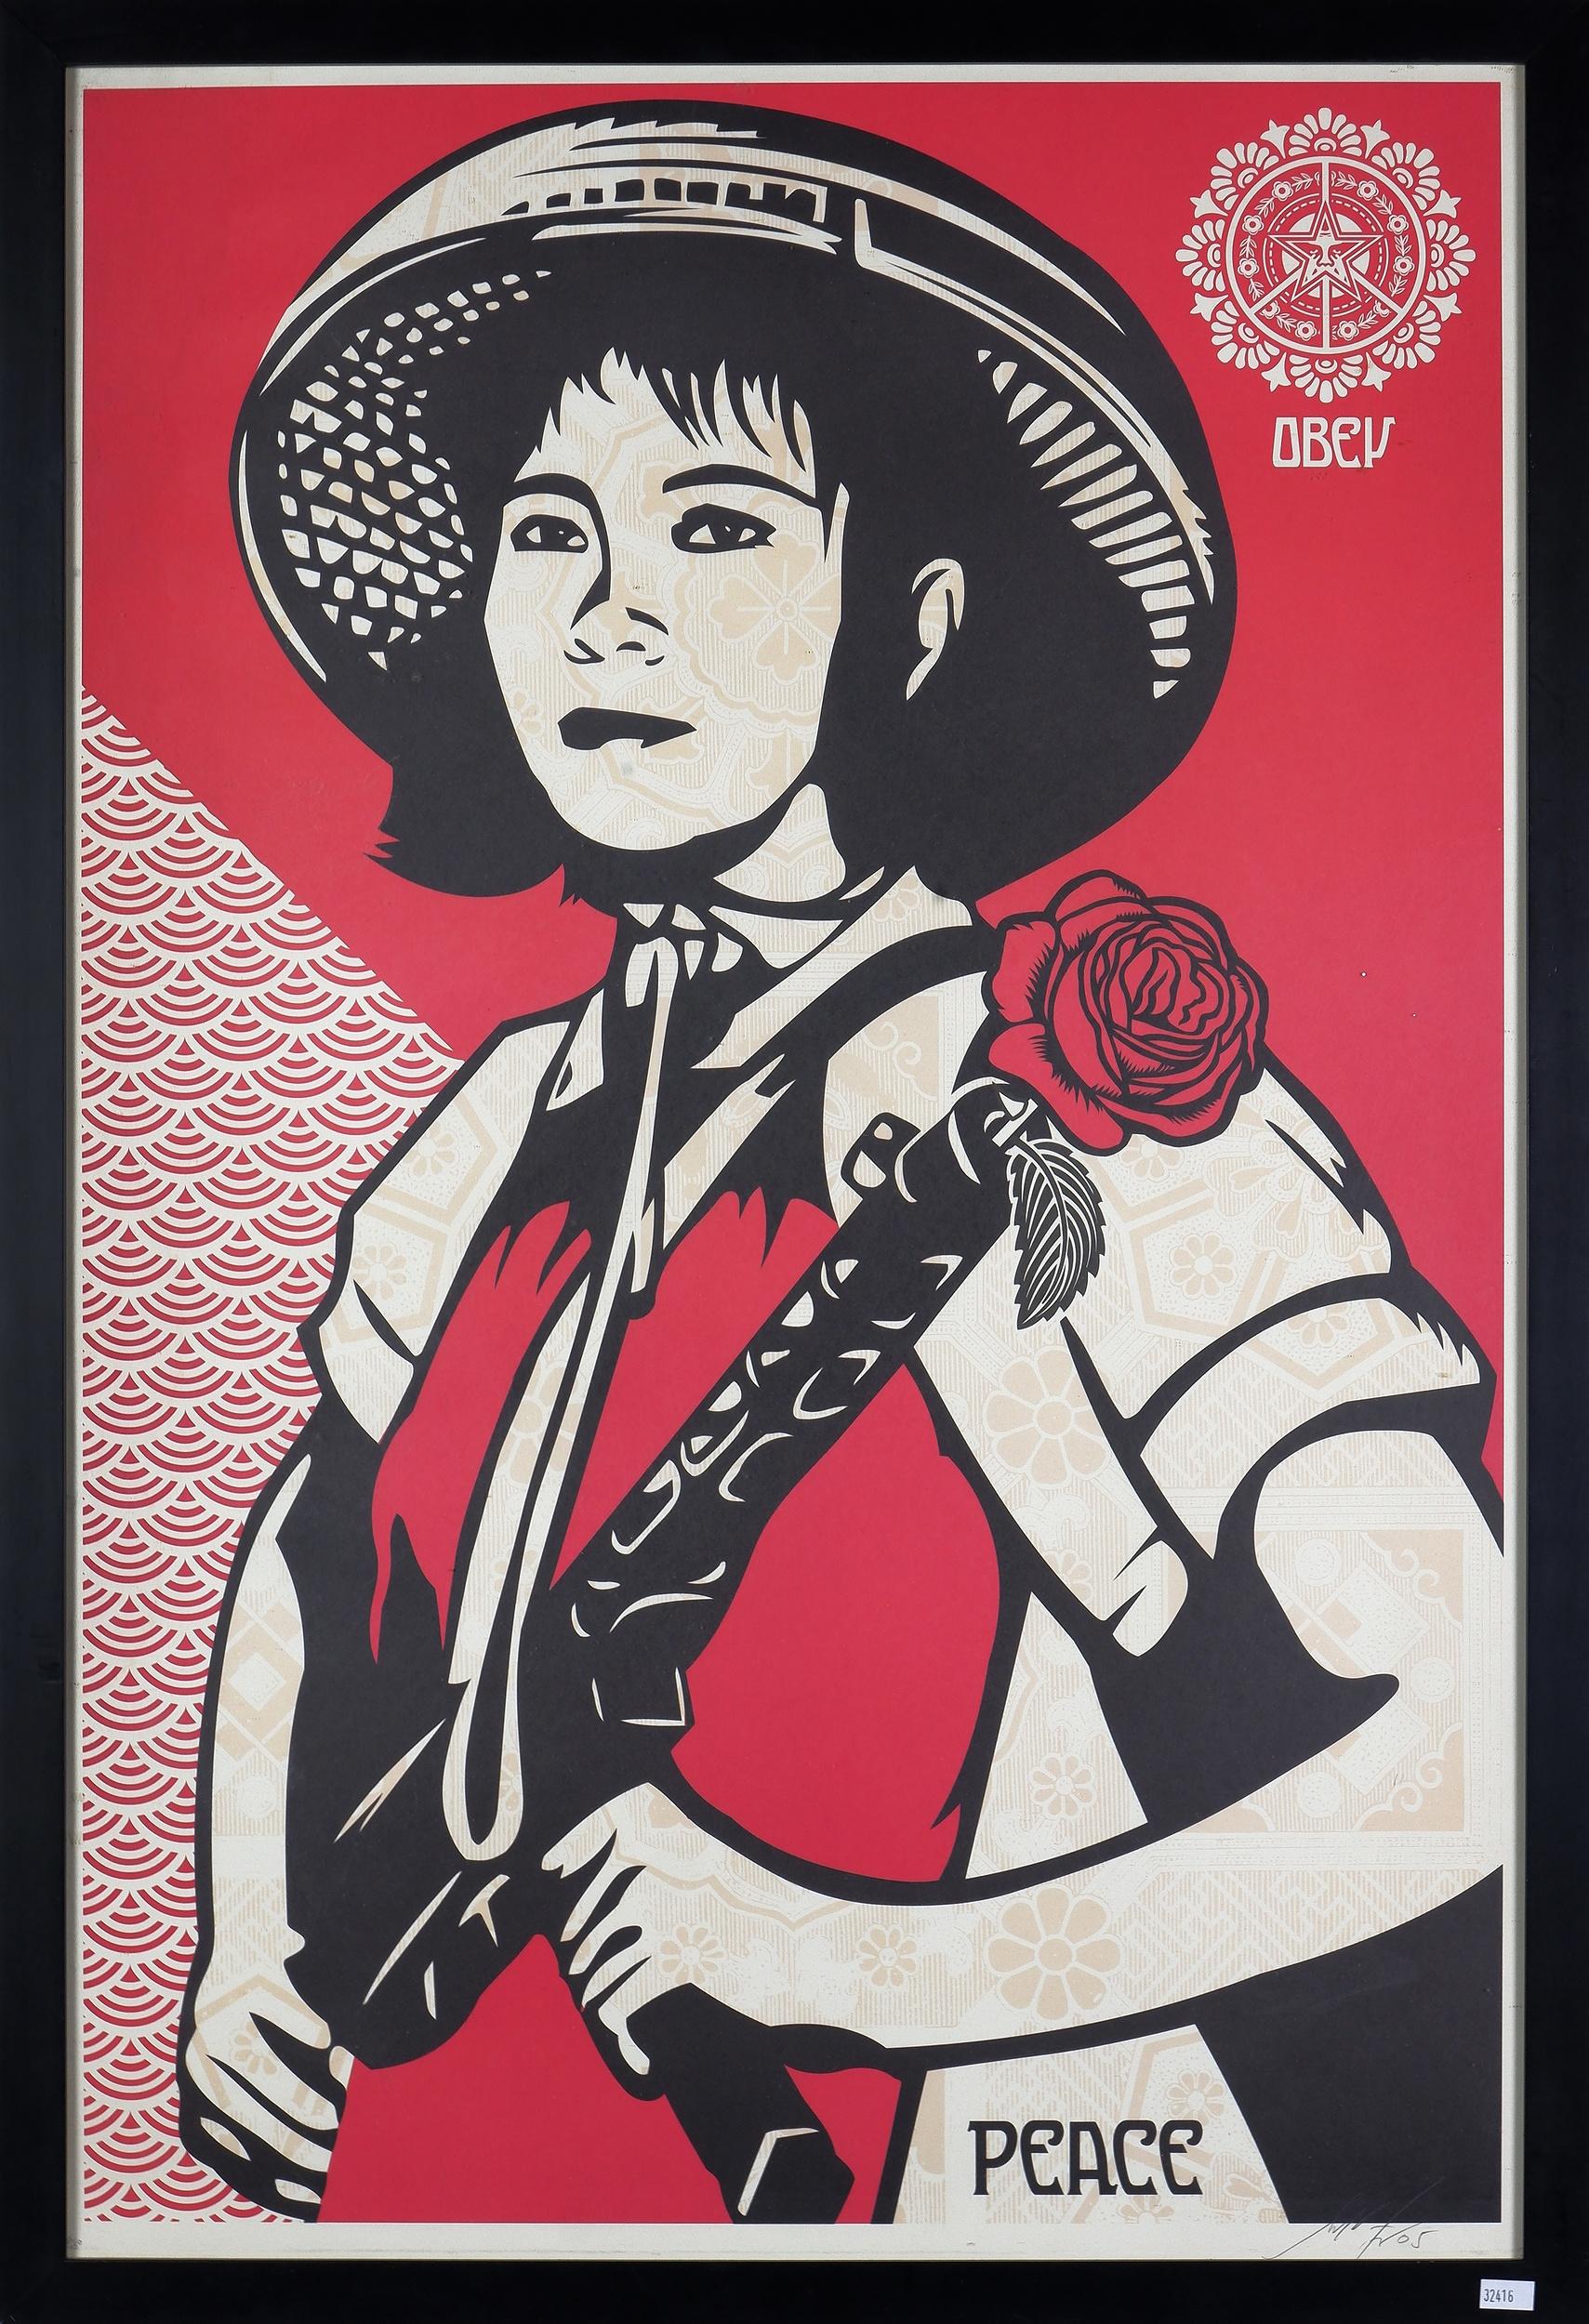 'Shepard Fairey (born 1970, American), Obey - Peace, Screenprint'